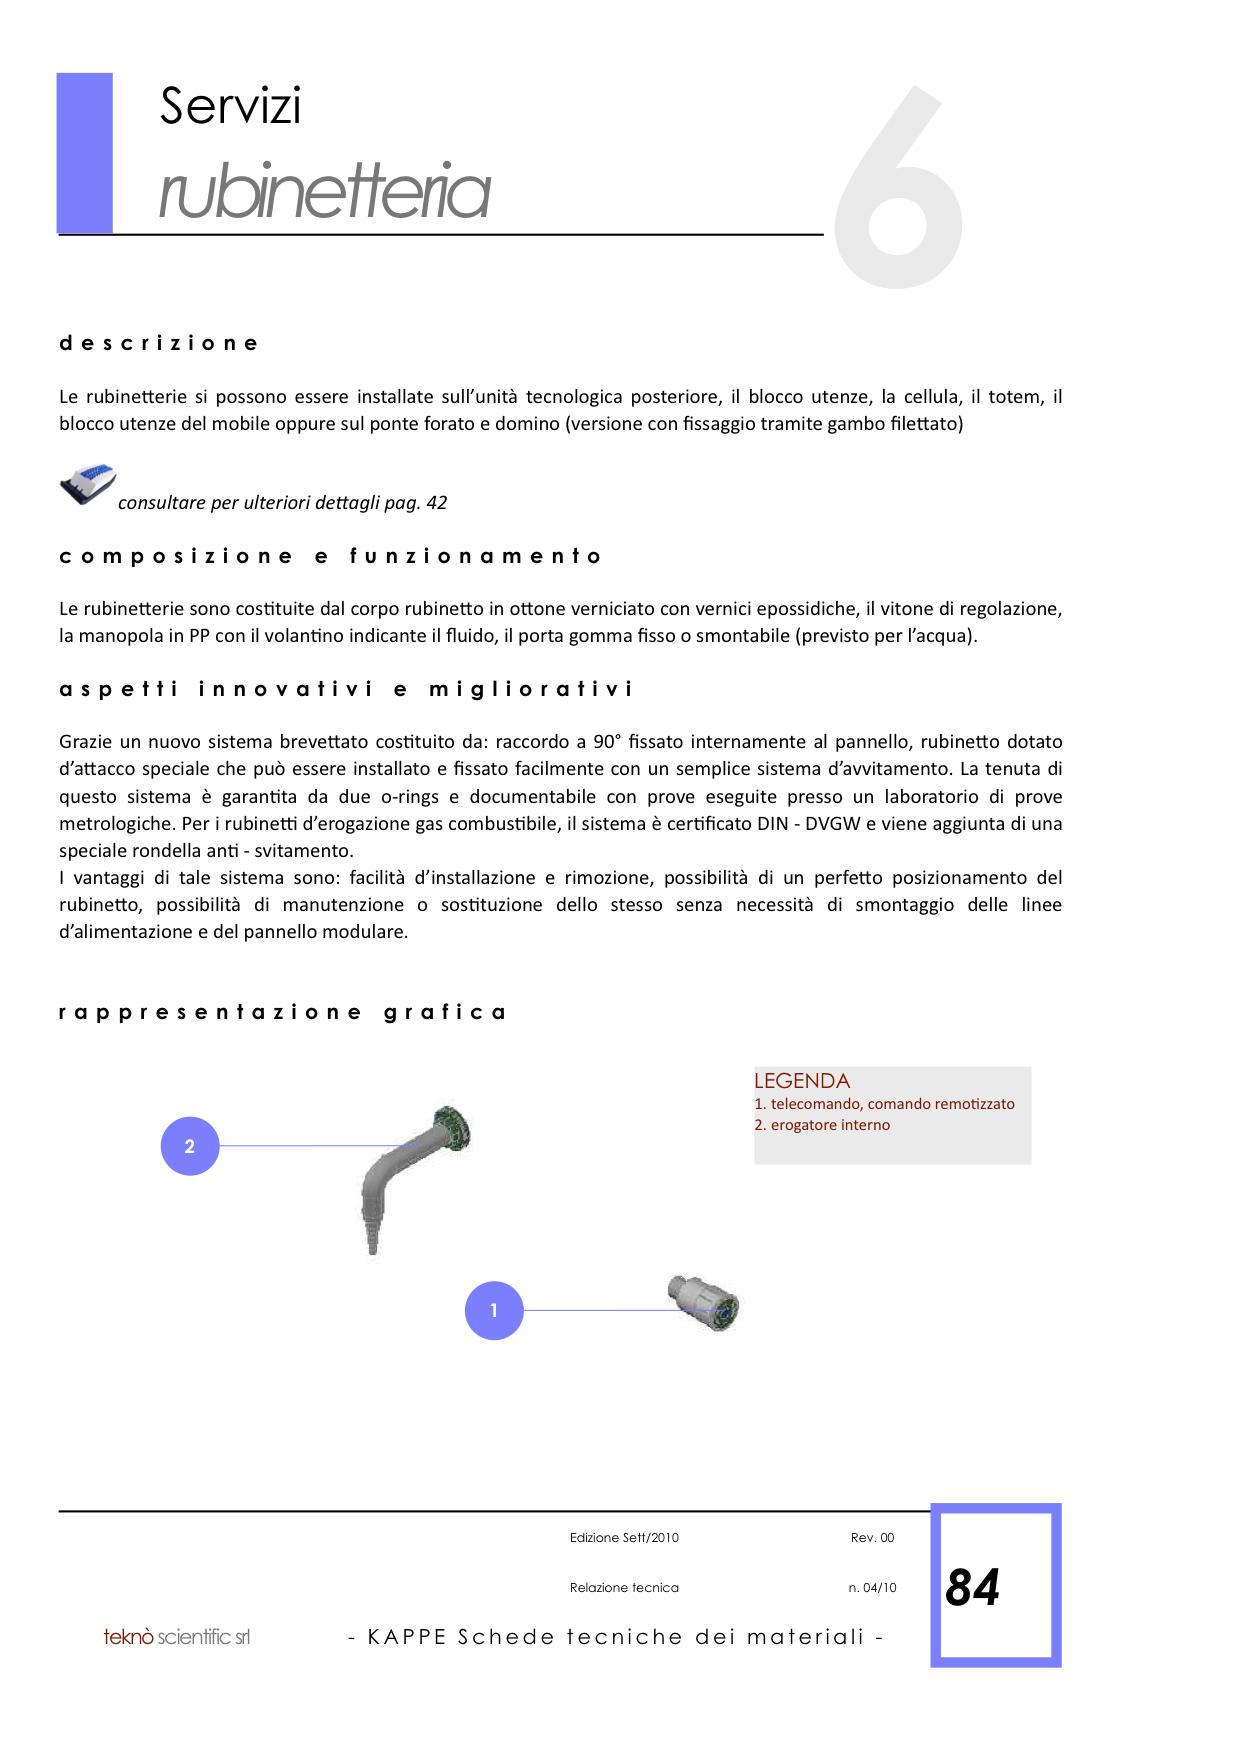 KAPPE Schede tecniche materiali copia 34.png